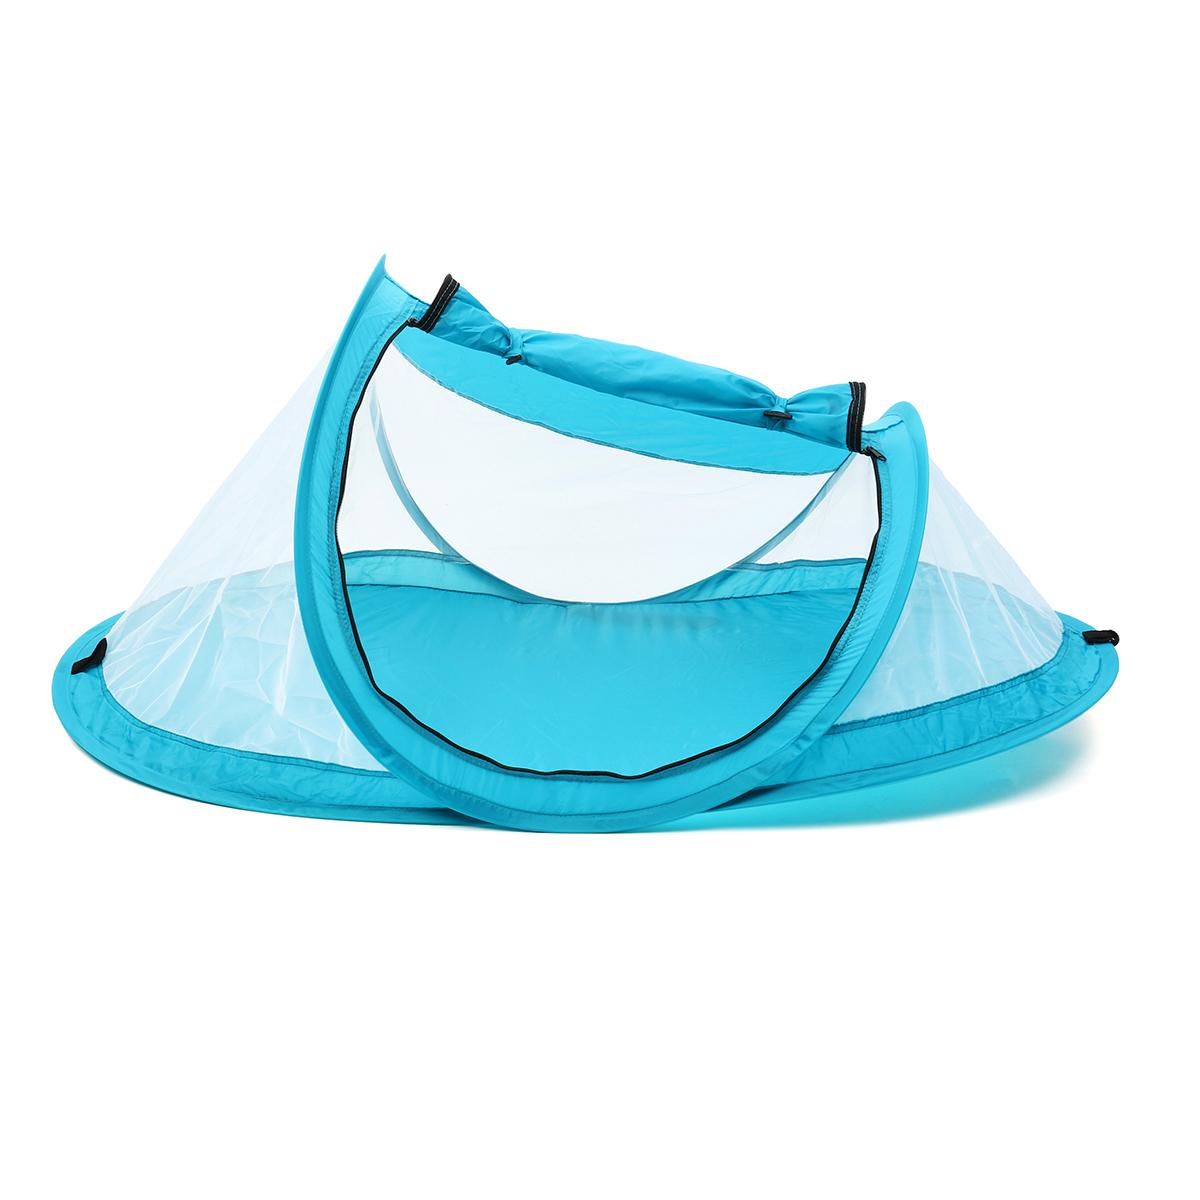 Pop-Up-Portable-Beach-Tent-Canopy-Sun-Shade-Shelter-Anti-UV-Baby-Summer-Camping